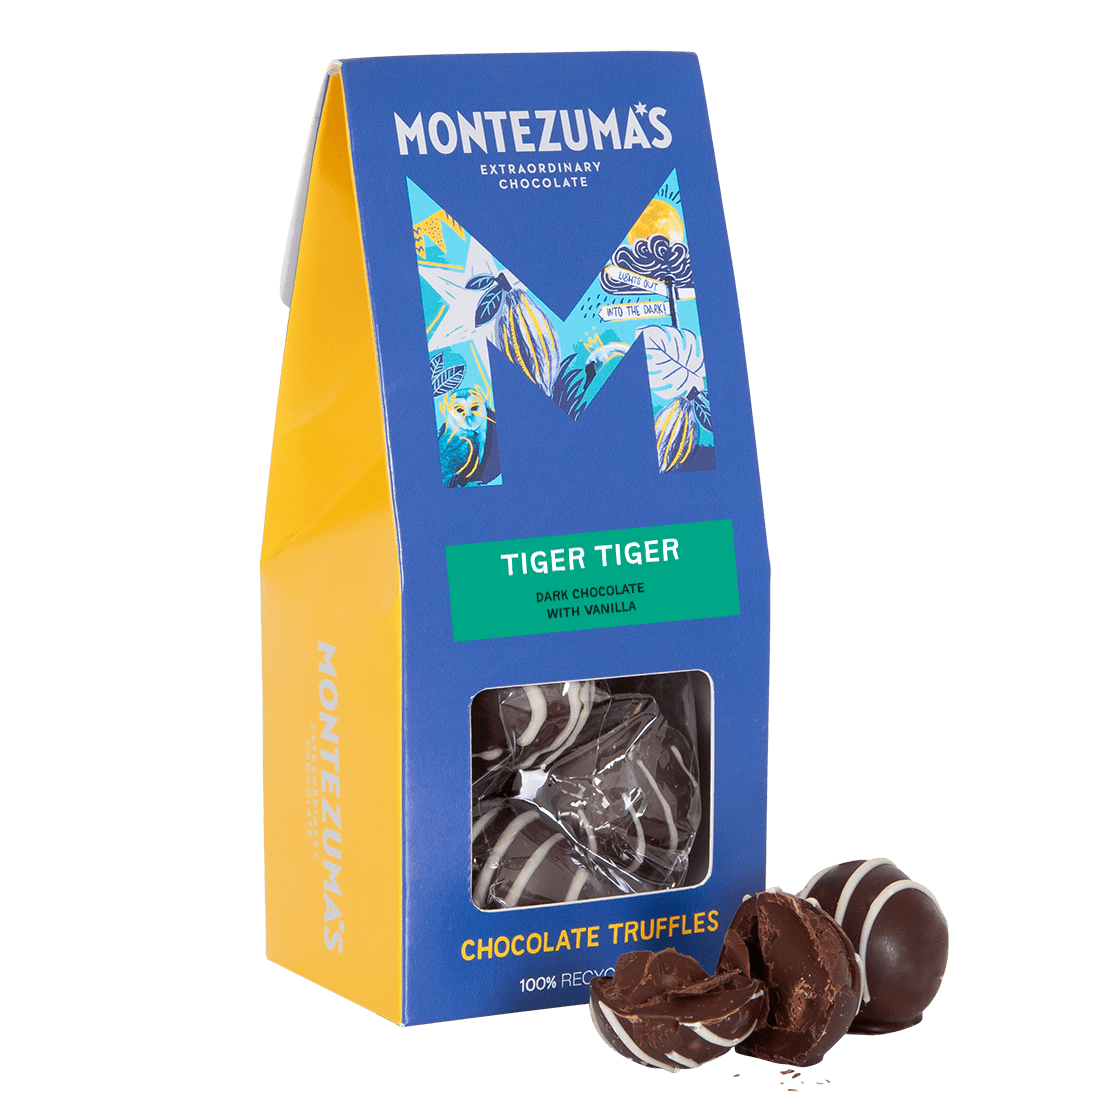 Tiger Tiger - Dark Chocolate Truffles with Vanilla